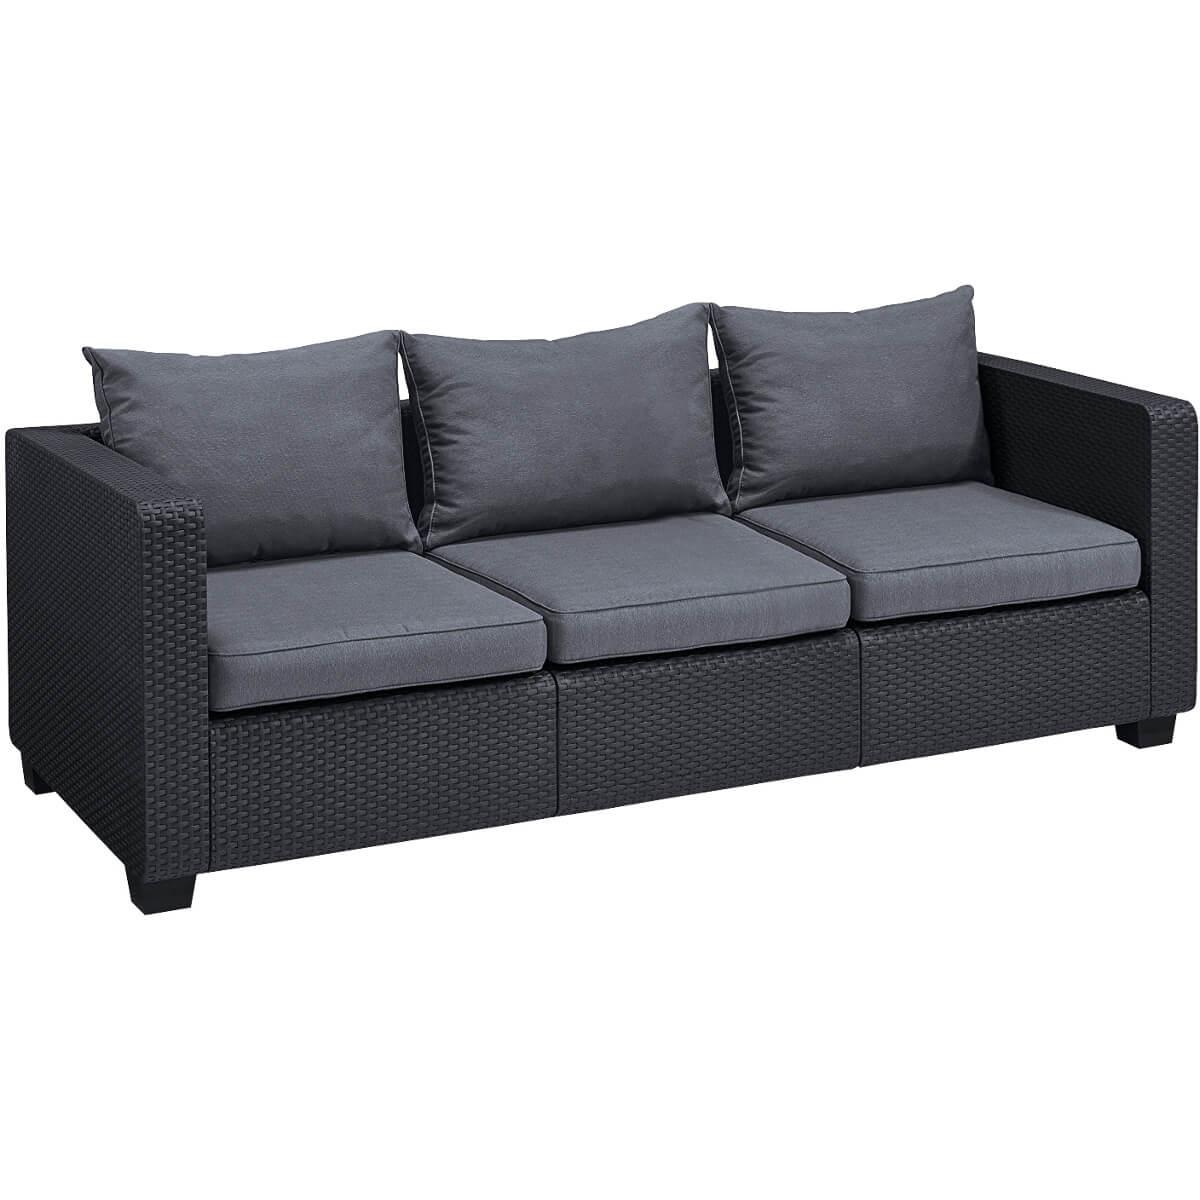 Диван Keter Salta 3 sofa